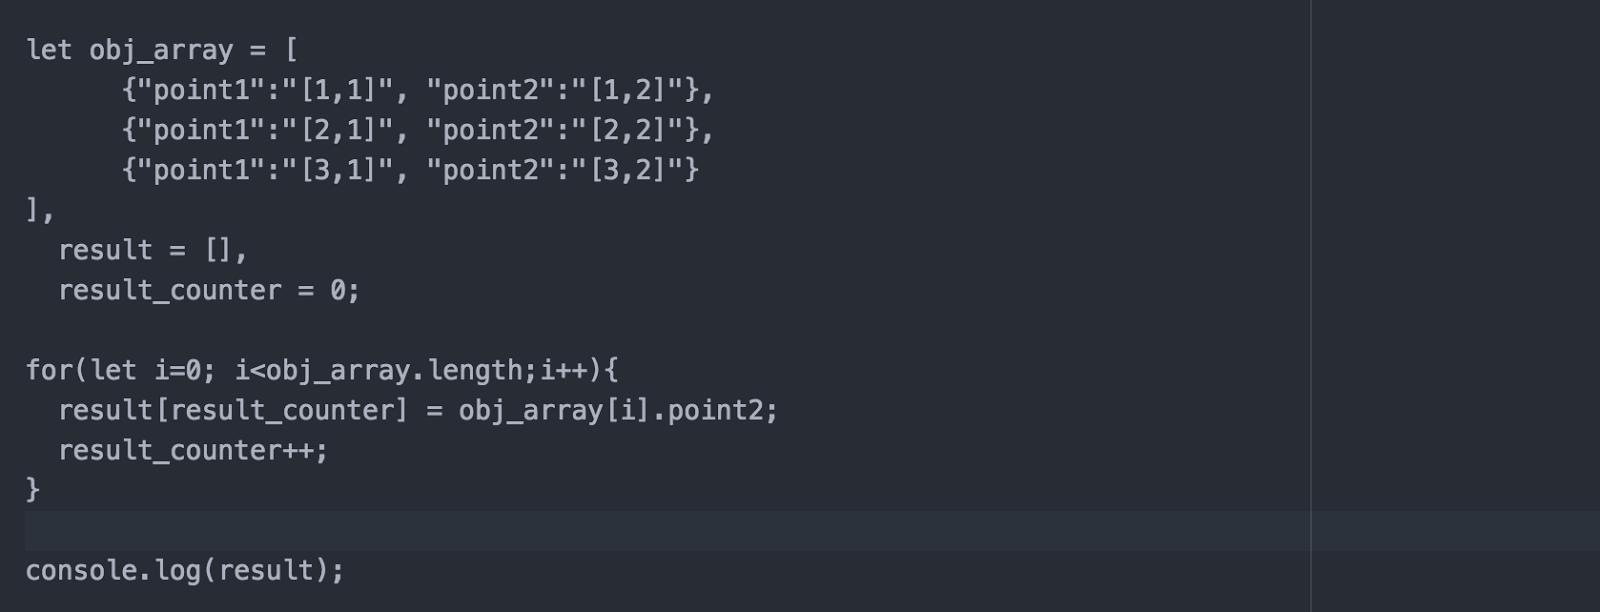 ES6] จัดการ Object Array ด้วย forEach เวิคกว่า for? | varit's diary